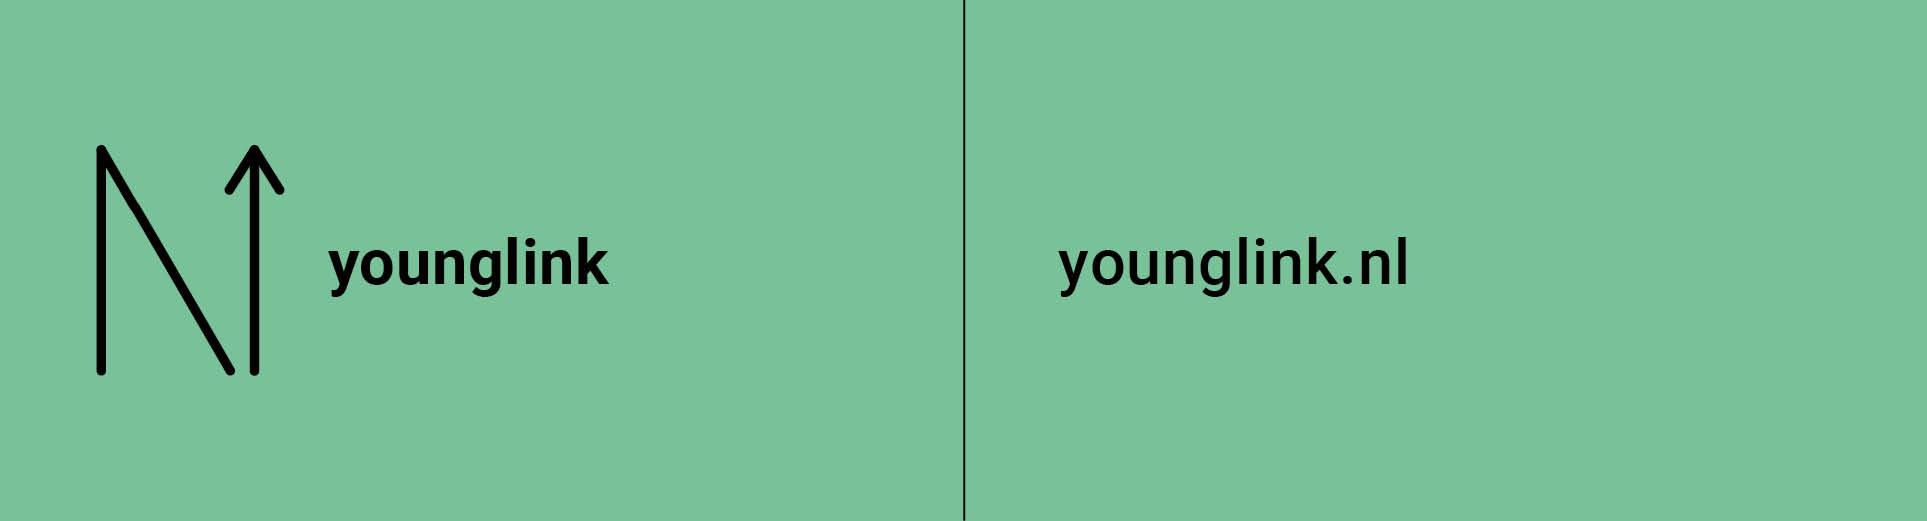 Younglink goes WalkieTalkie - juni 2021